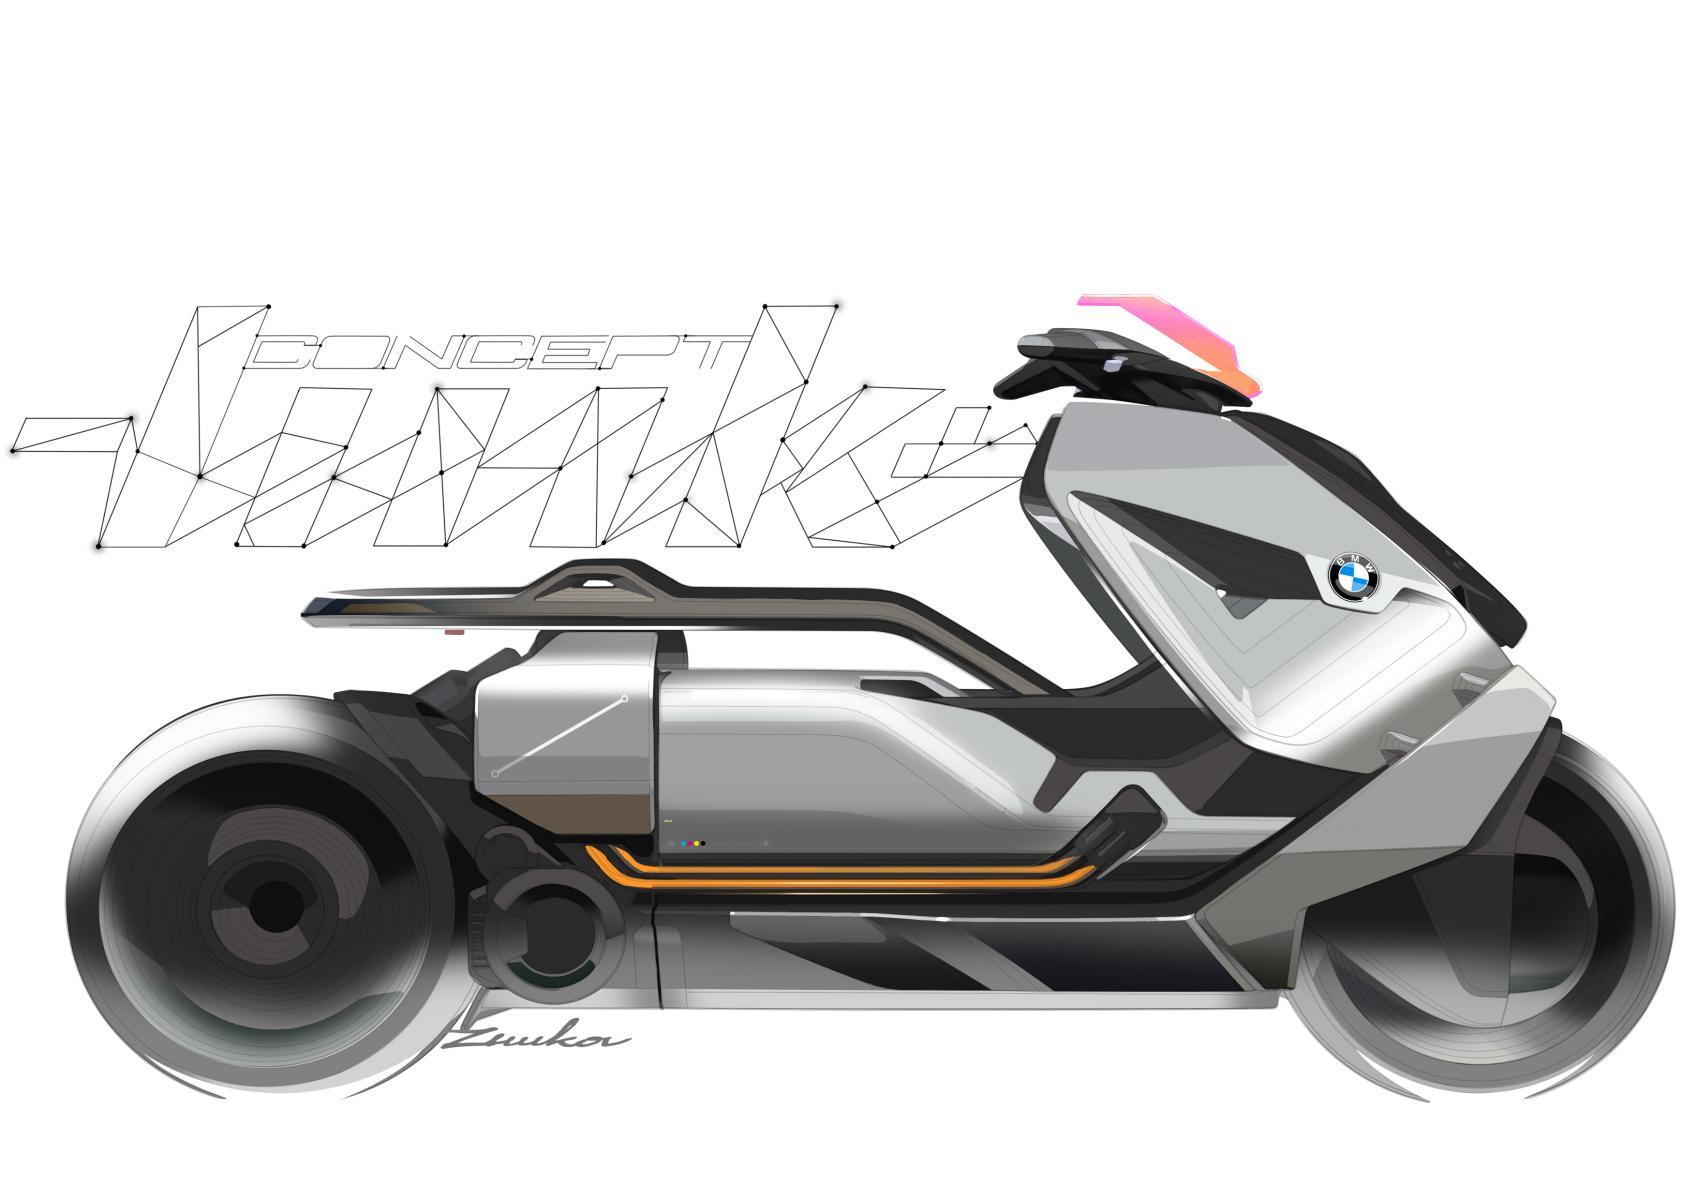 P90260587_highRes_bmw-motorrad-concept_01 拷貝.JPG